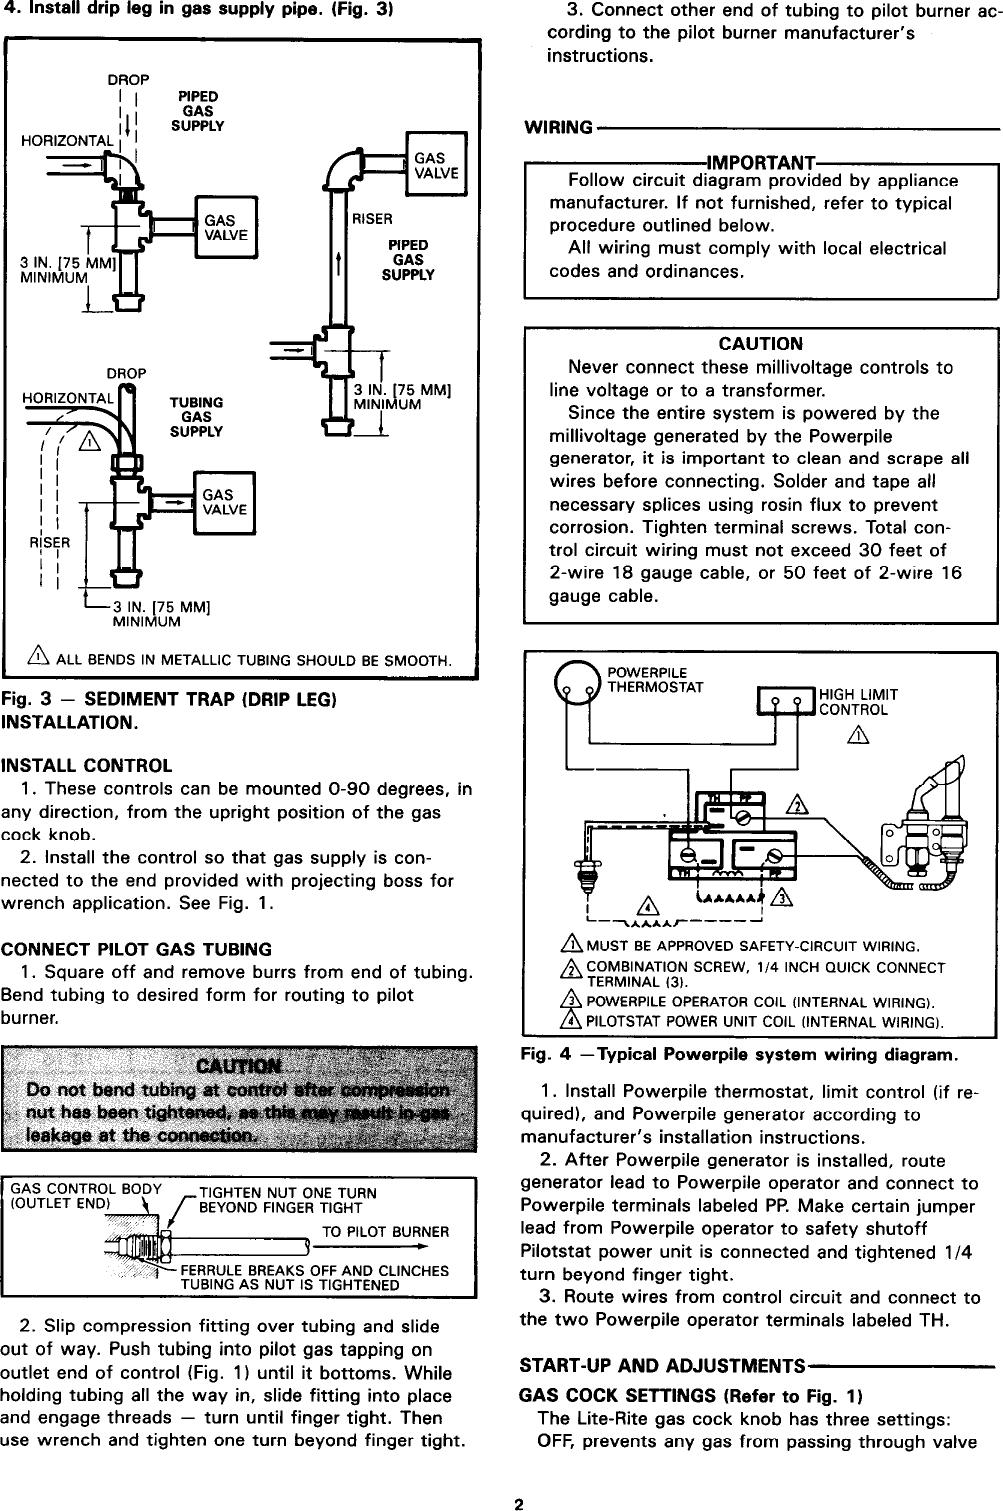 Vs820c Gas Valve Wiring Diagram - Alero Alternator Fuse Diagram -  audi-a3.yenpancane.jeanjaures37.fr   Vs820c Gas Valve Wiring Diagram      Wiring Diagram Resource